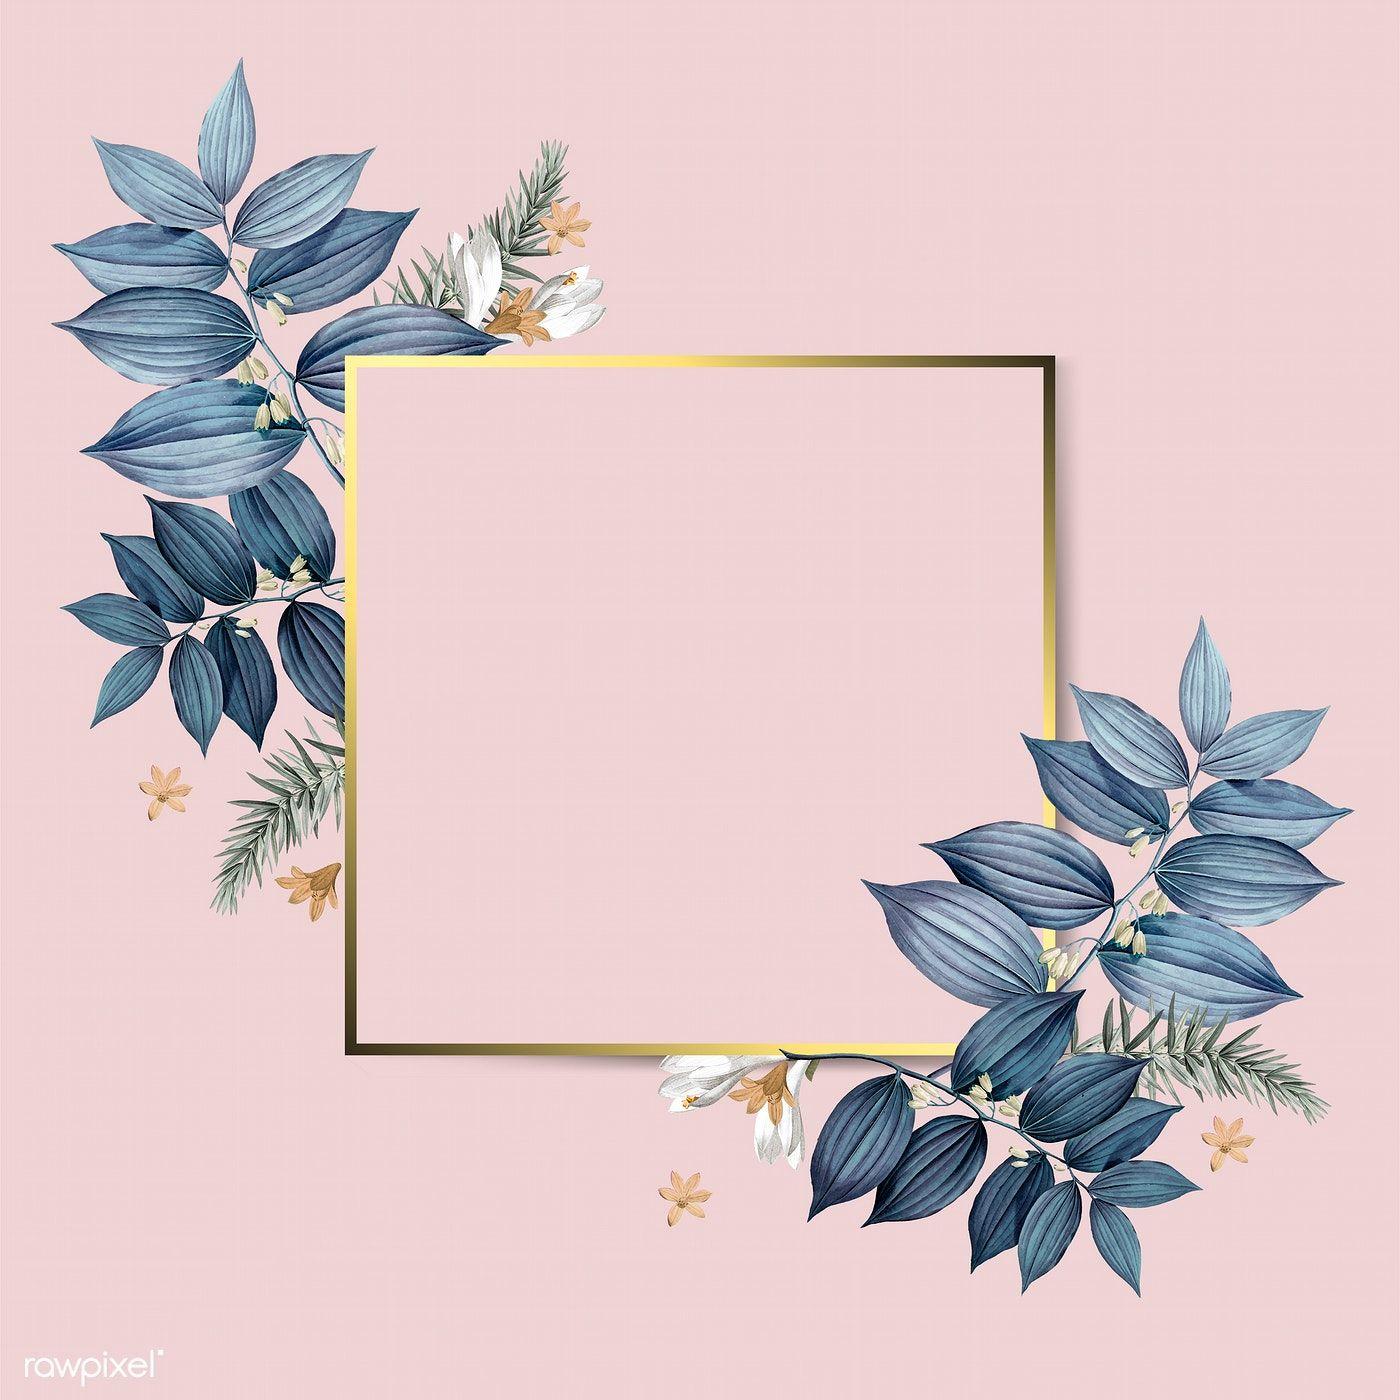 Download premium vector of Empty floral frame design